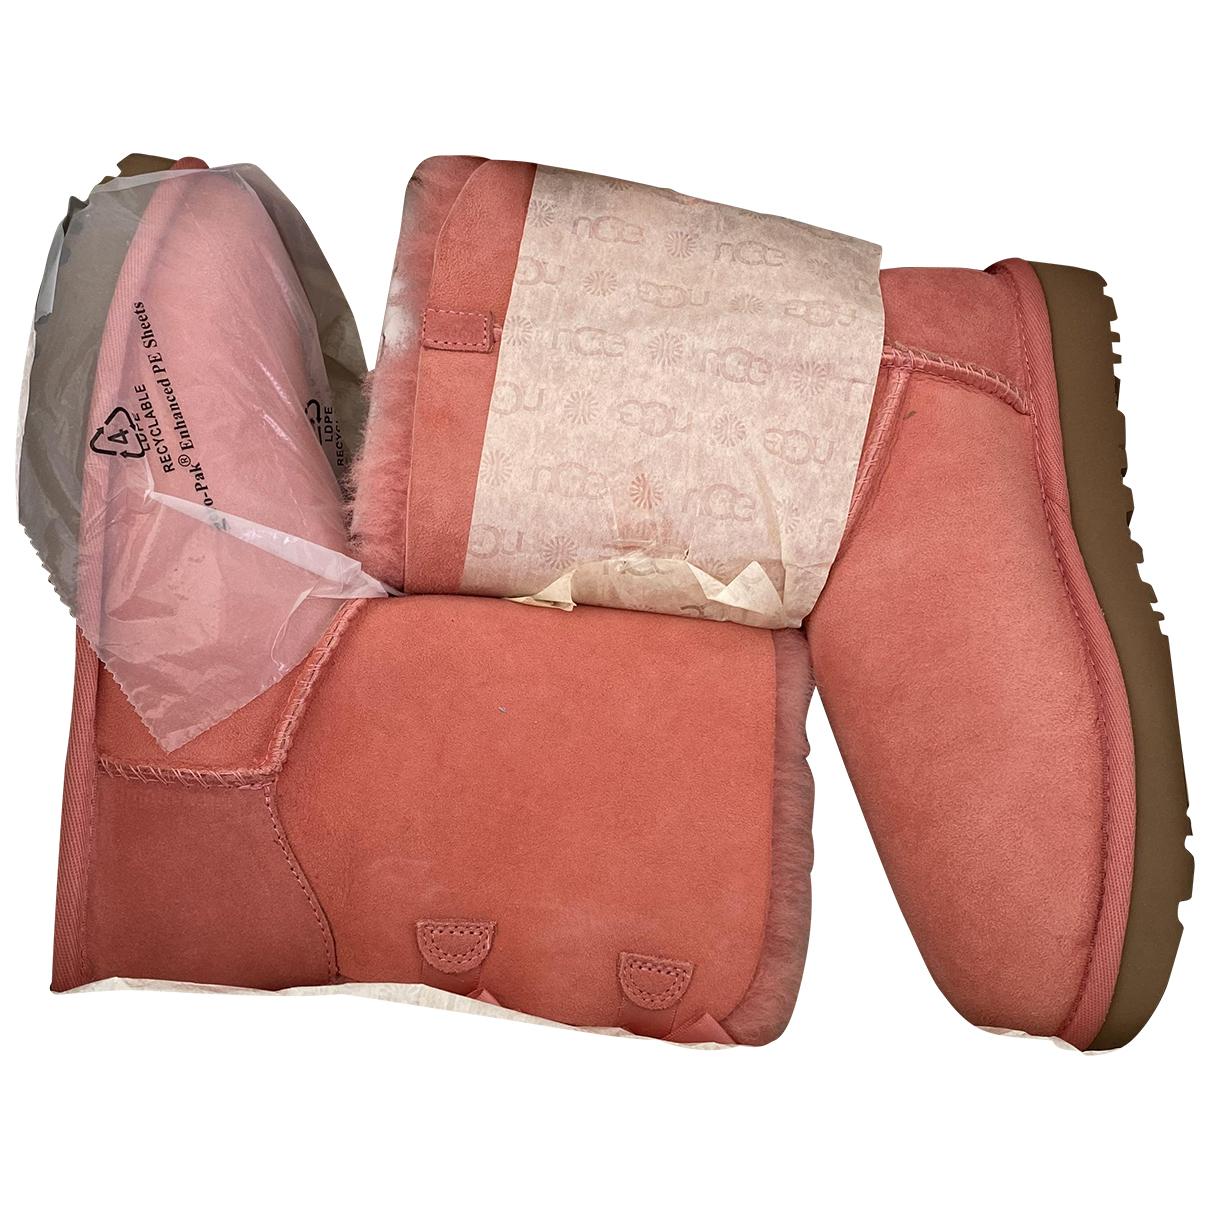 Ugg - Boots   pour femme en cuir - rose